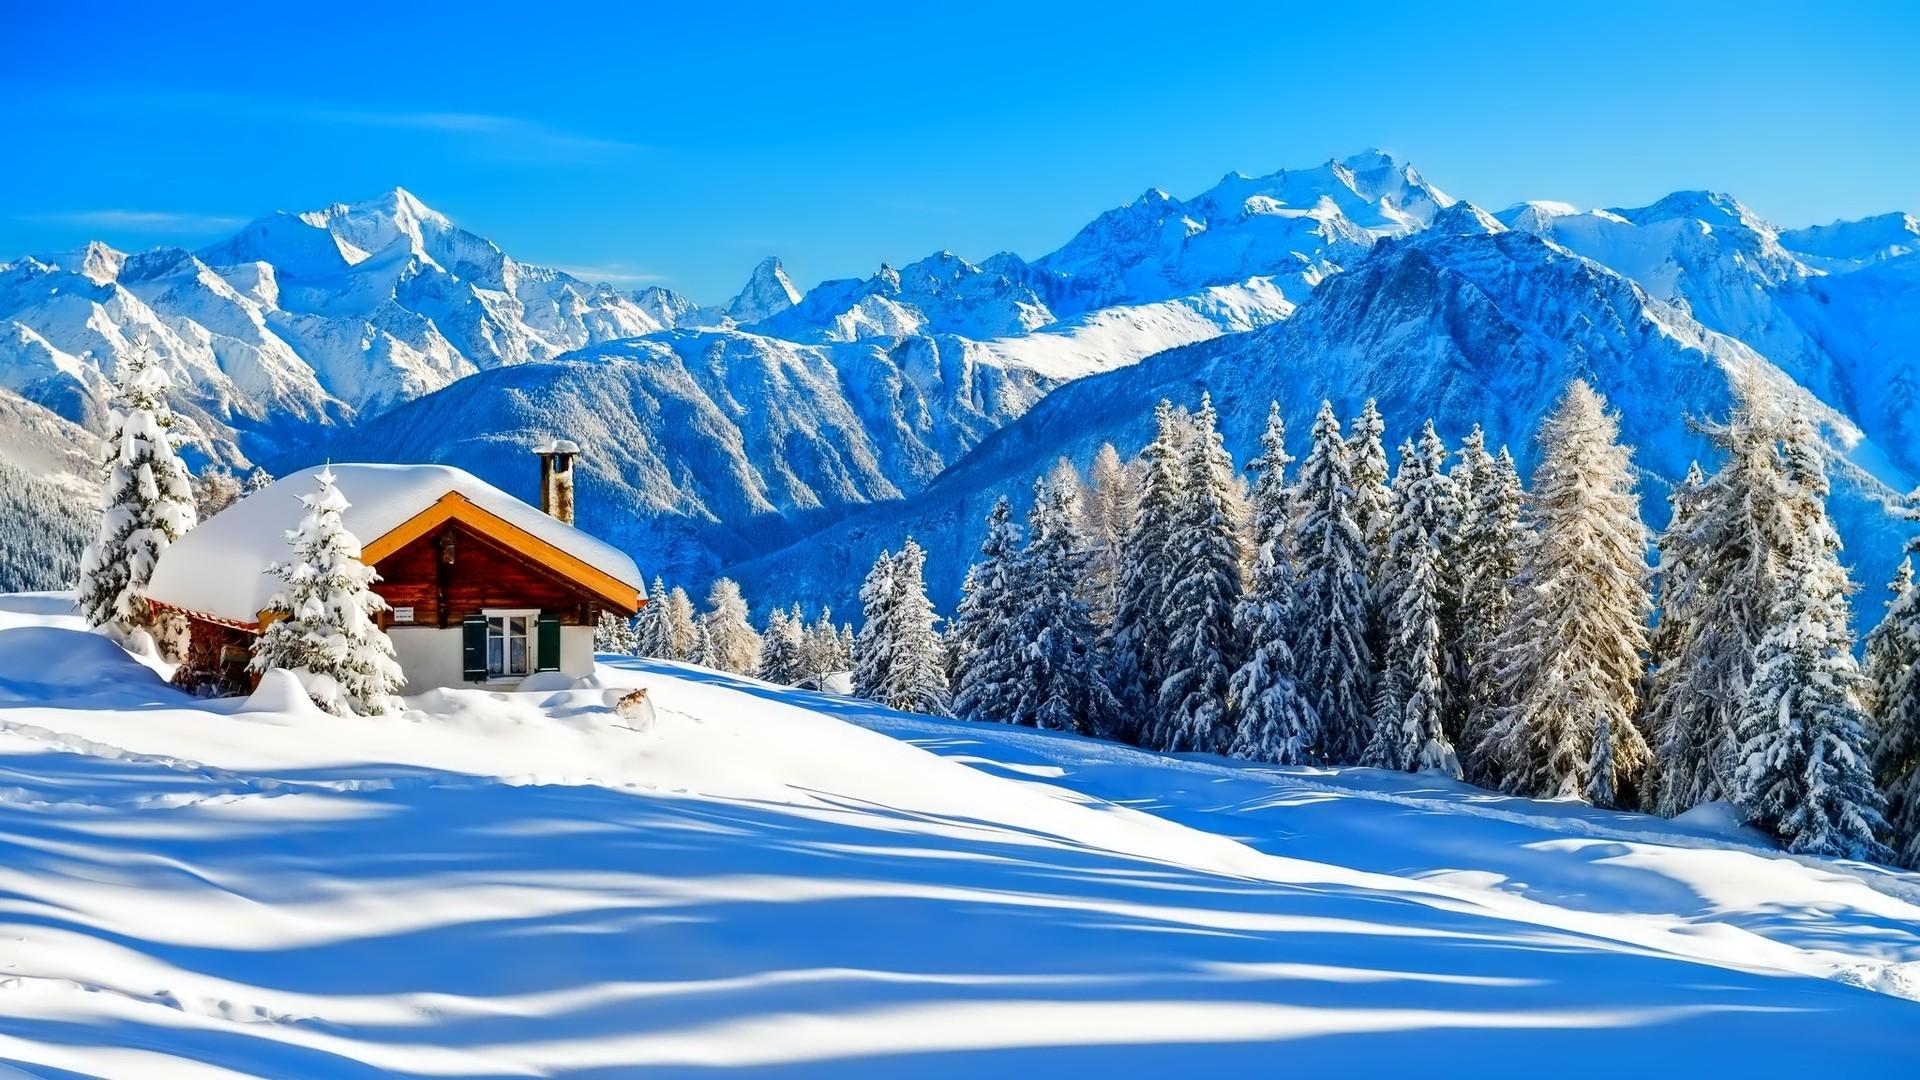 Download Wallpaper High Resolution Winter - 1190598-hd-winter-wallpapers-1080p-1920x1080-cell-phone  2018_39368.jpg